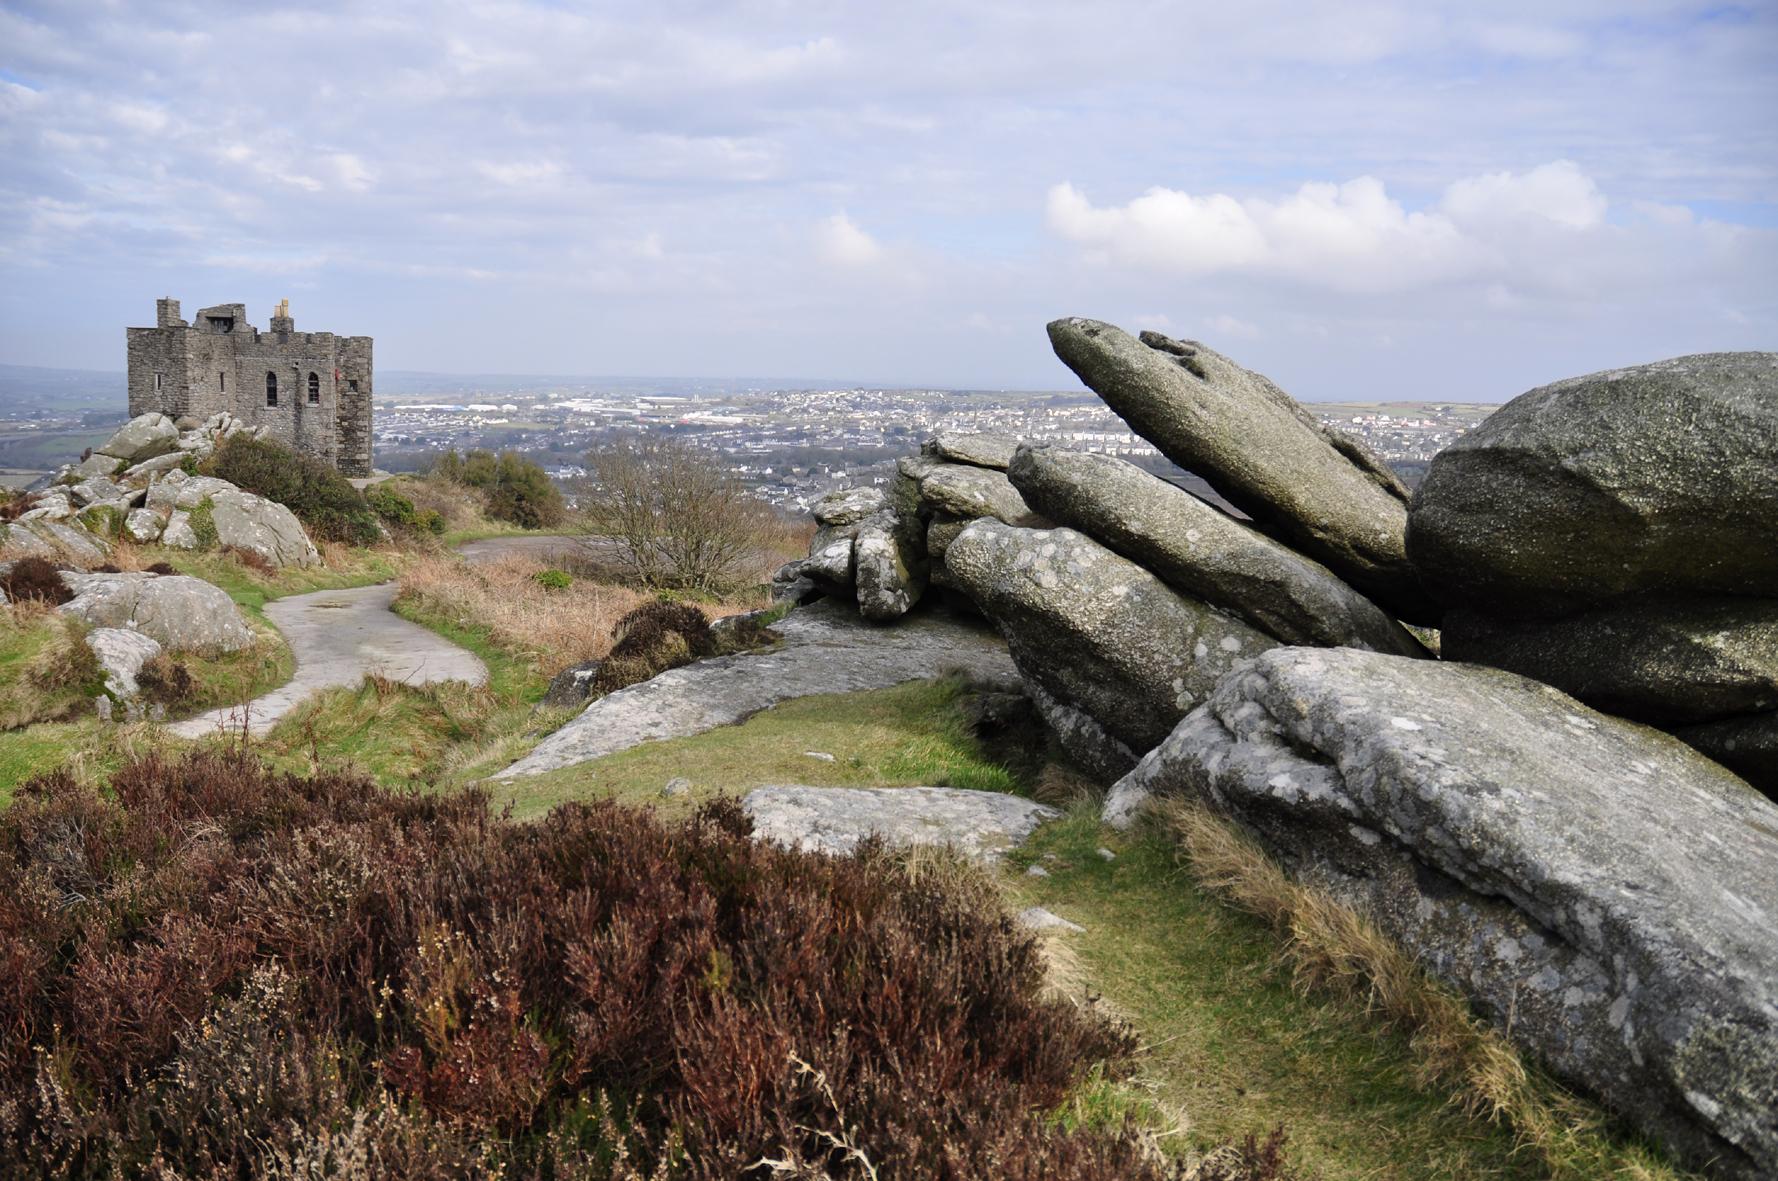 Up Carn Brea Hill